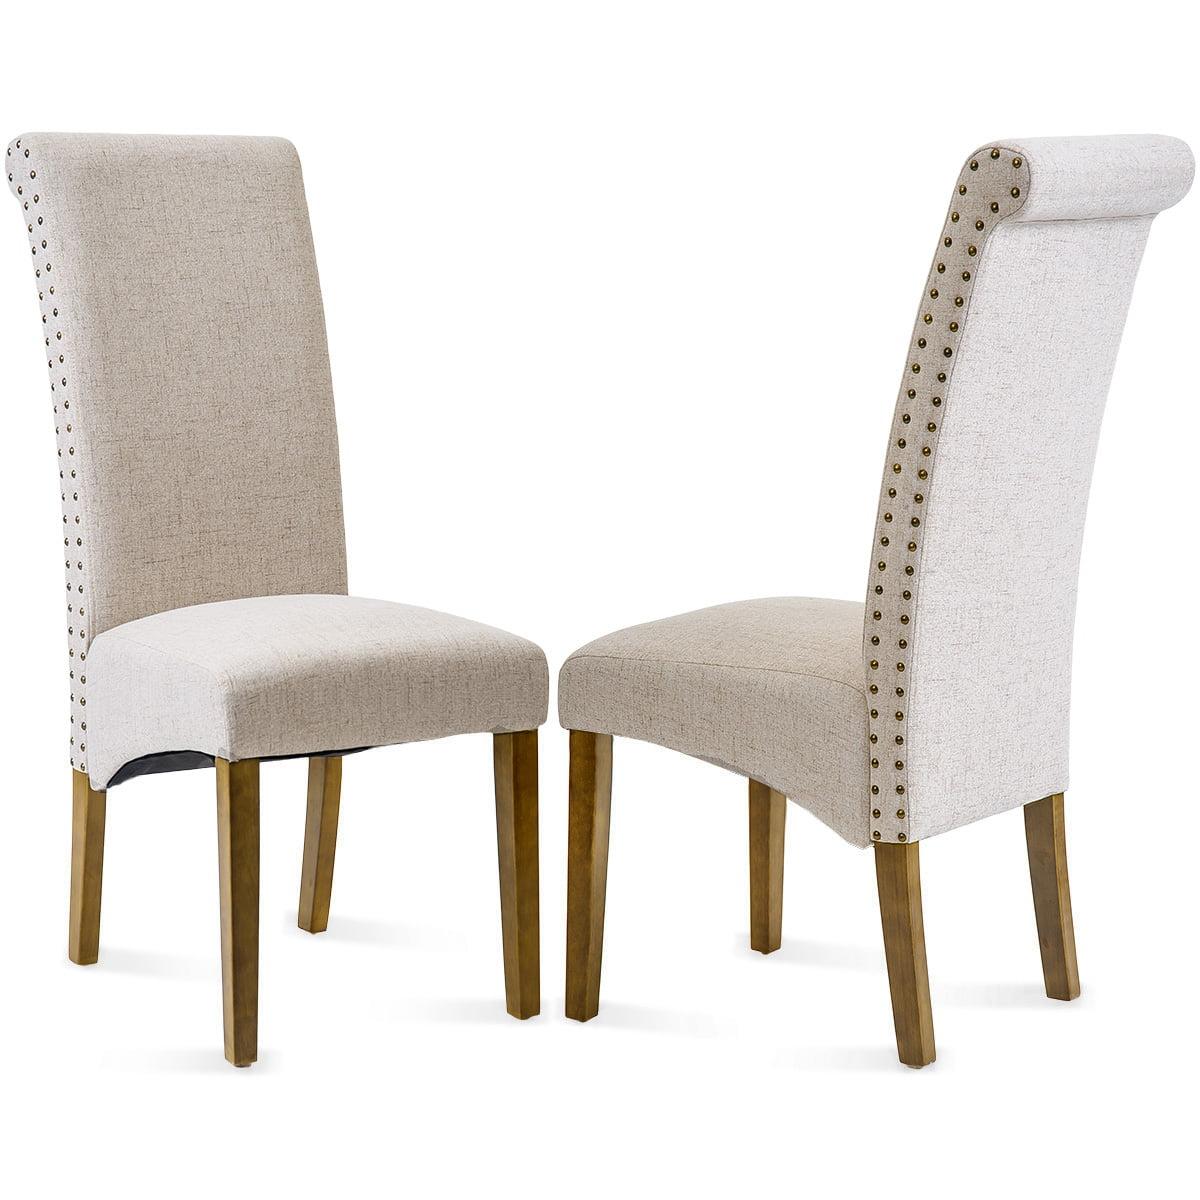 41'' x 17'' x 20'' Linen Classic Fabric Dining Chair ...